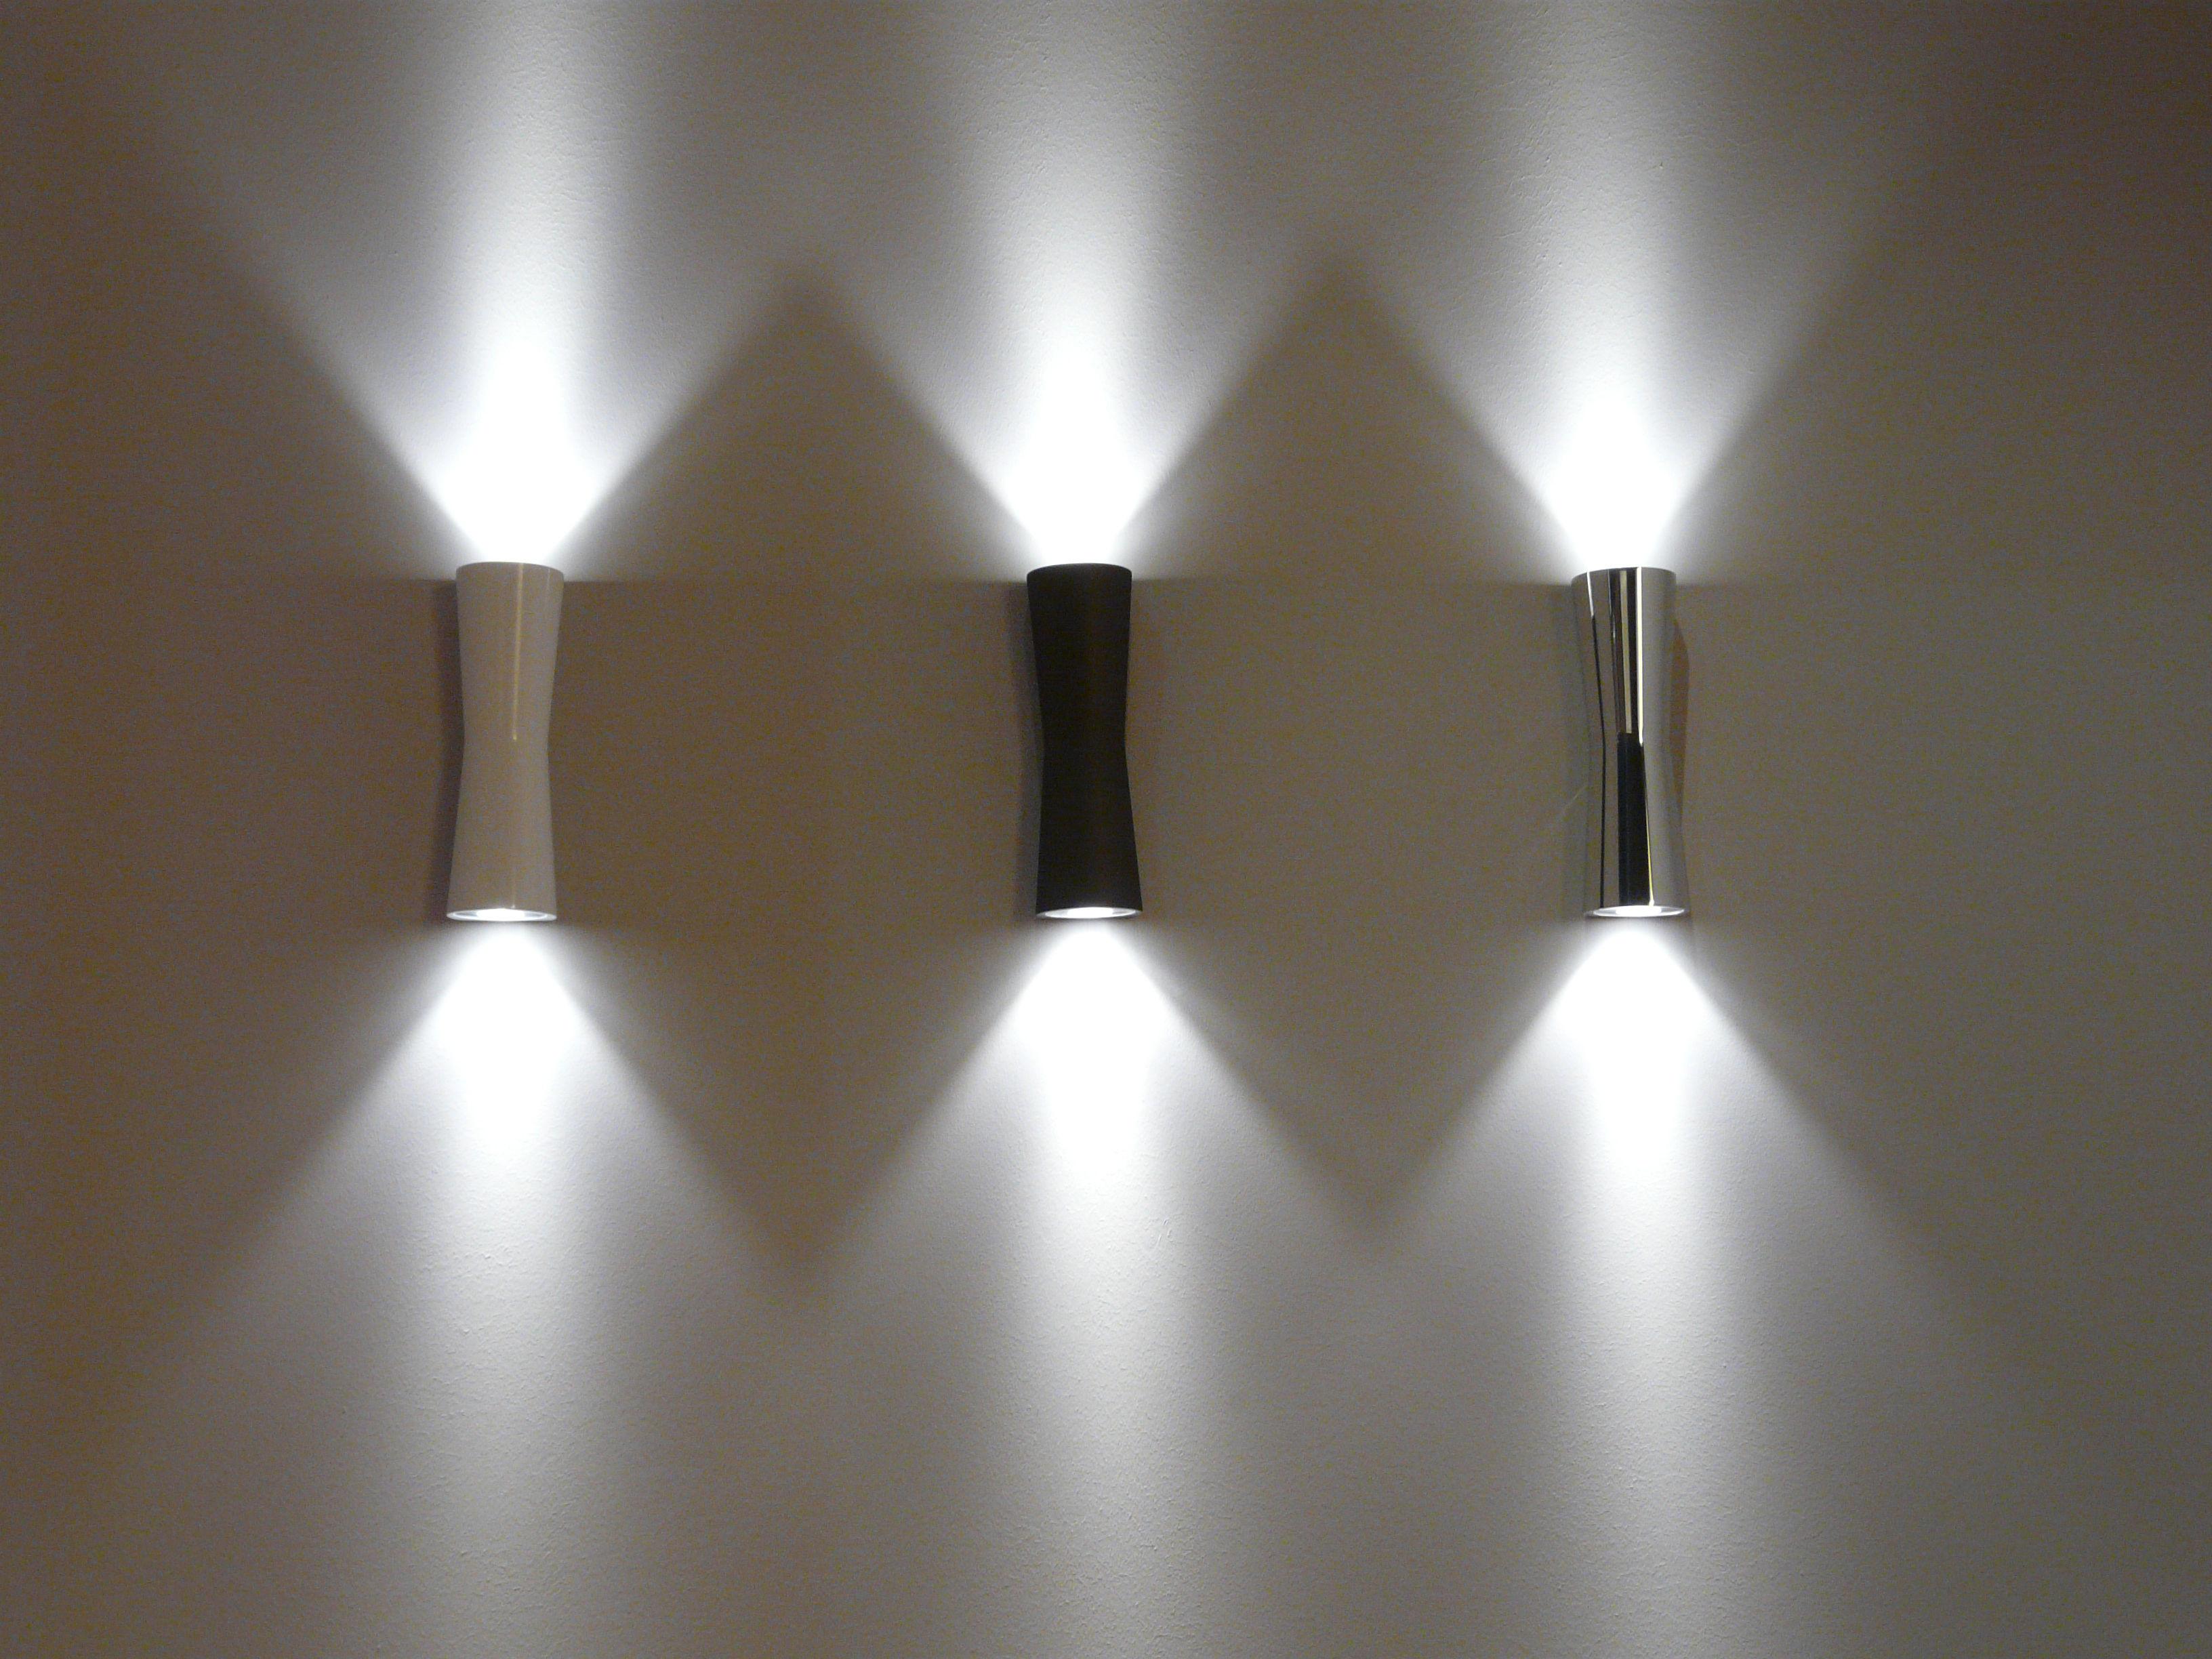 Led Outdoor Wall Light picture on prod clessidra 20 wall light led indoor outdoor by flos reff1583026 with Led Outdoor Wall Light, Outdoor Lighting ideas 2eaf1cd20fb8d8b07e87bb64424f6e83